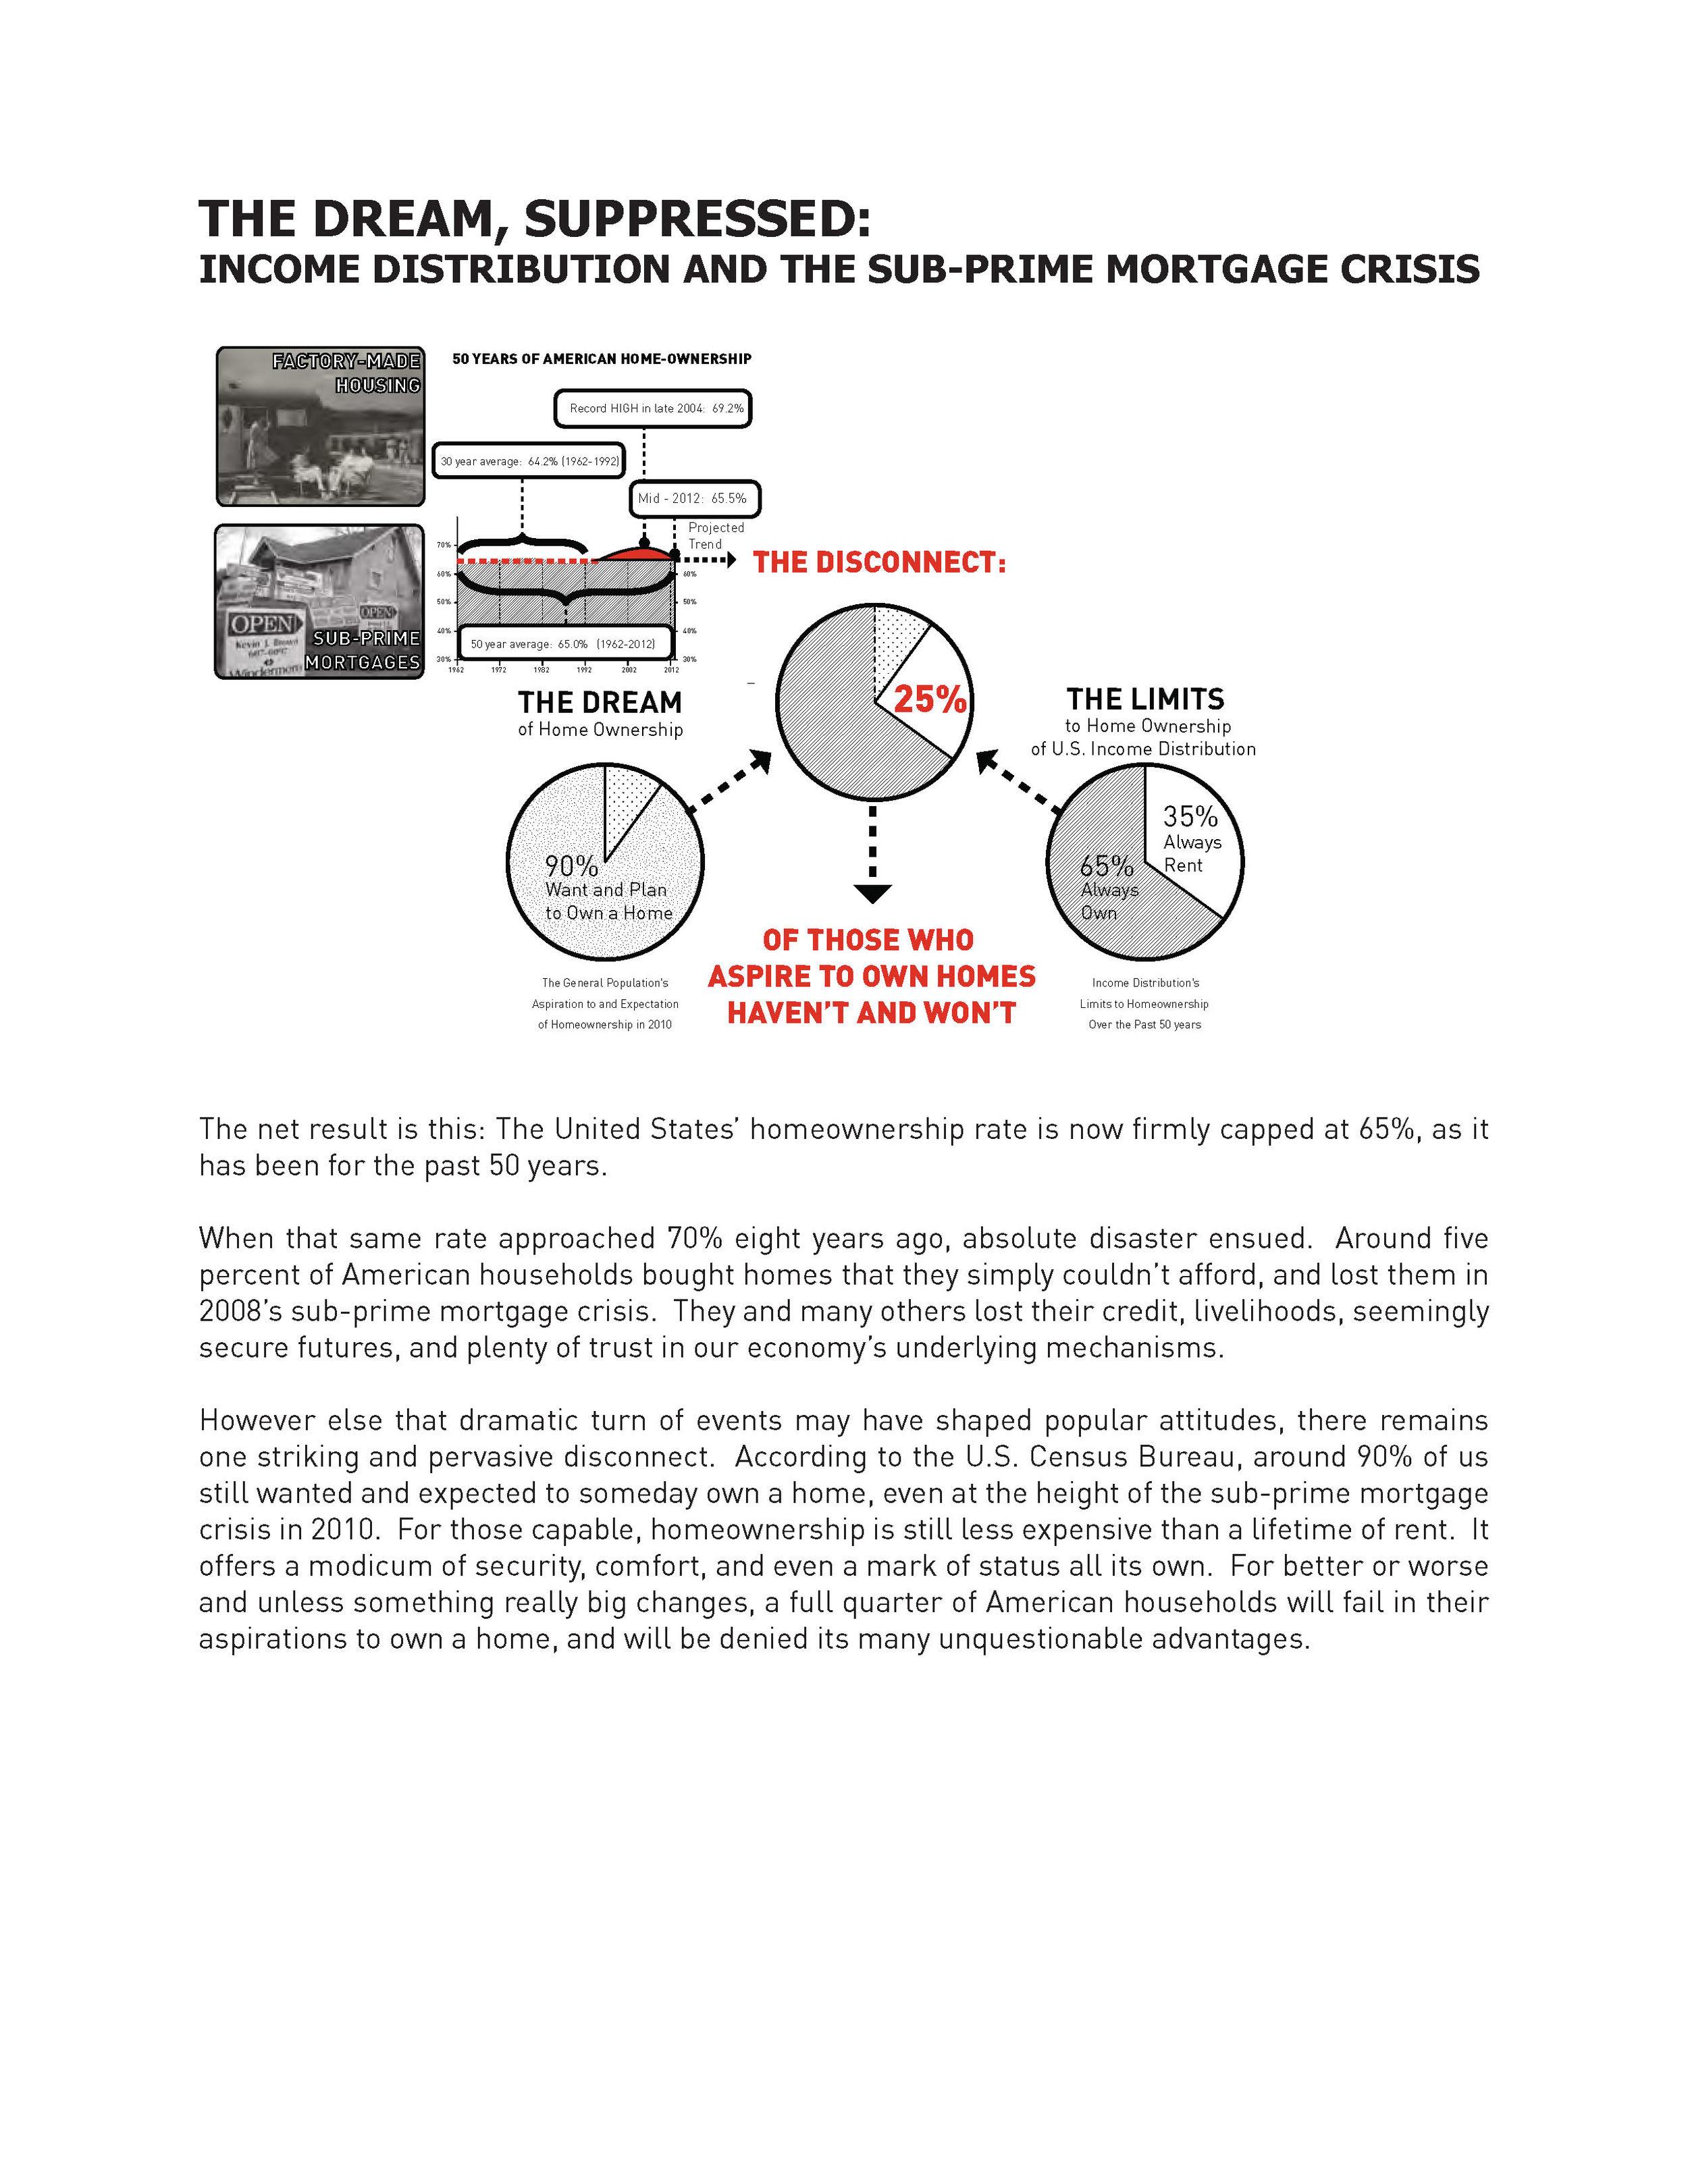 DSA_CMiller_Thesis_Slides_Boards_03_30_2013_Page_06.jpg